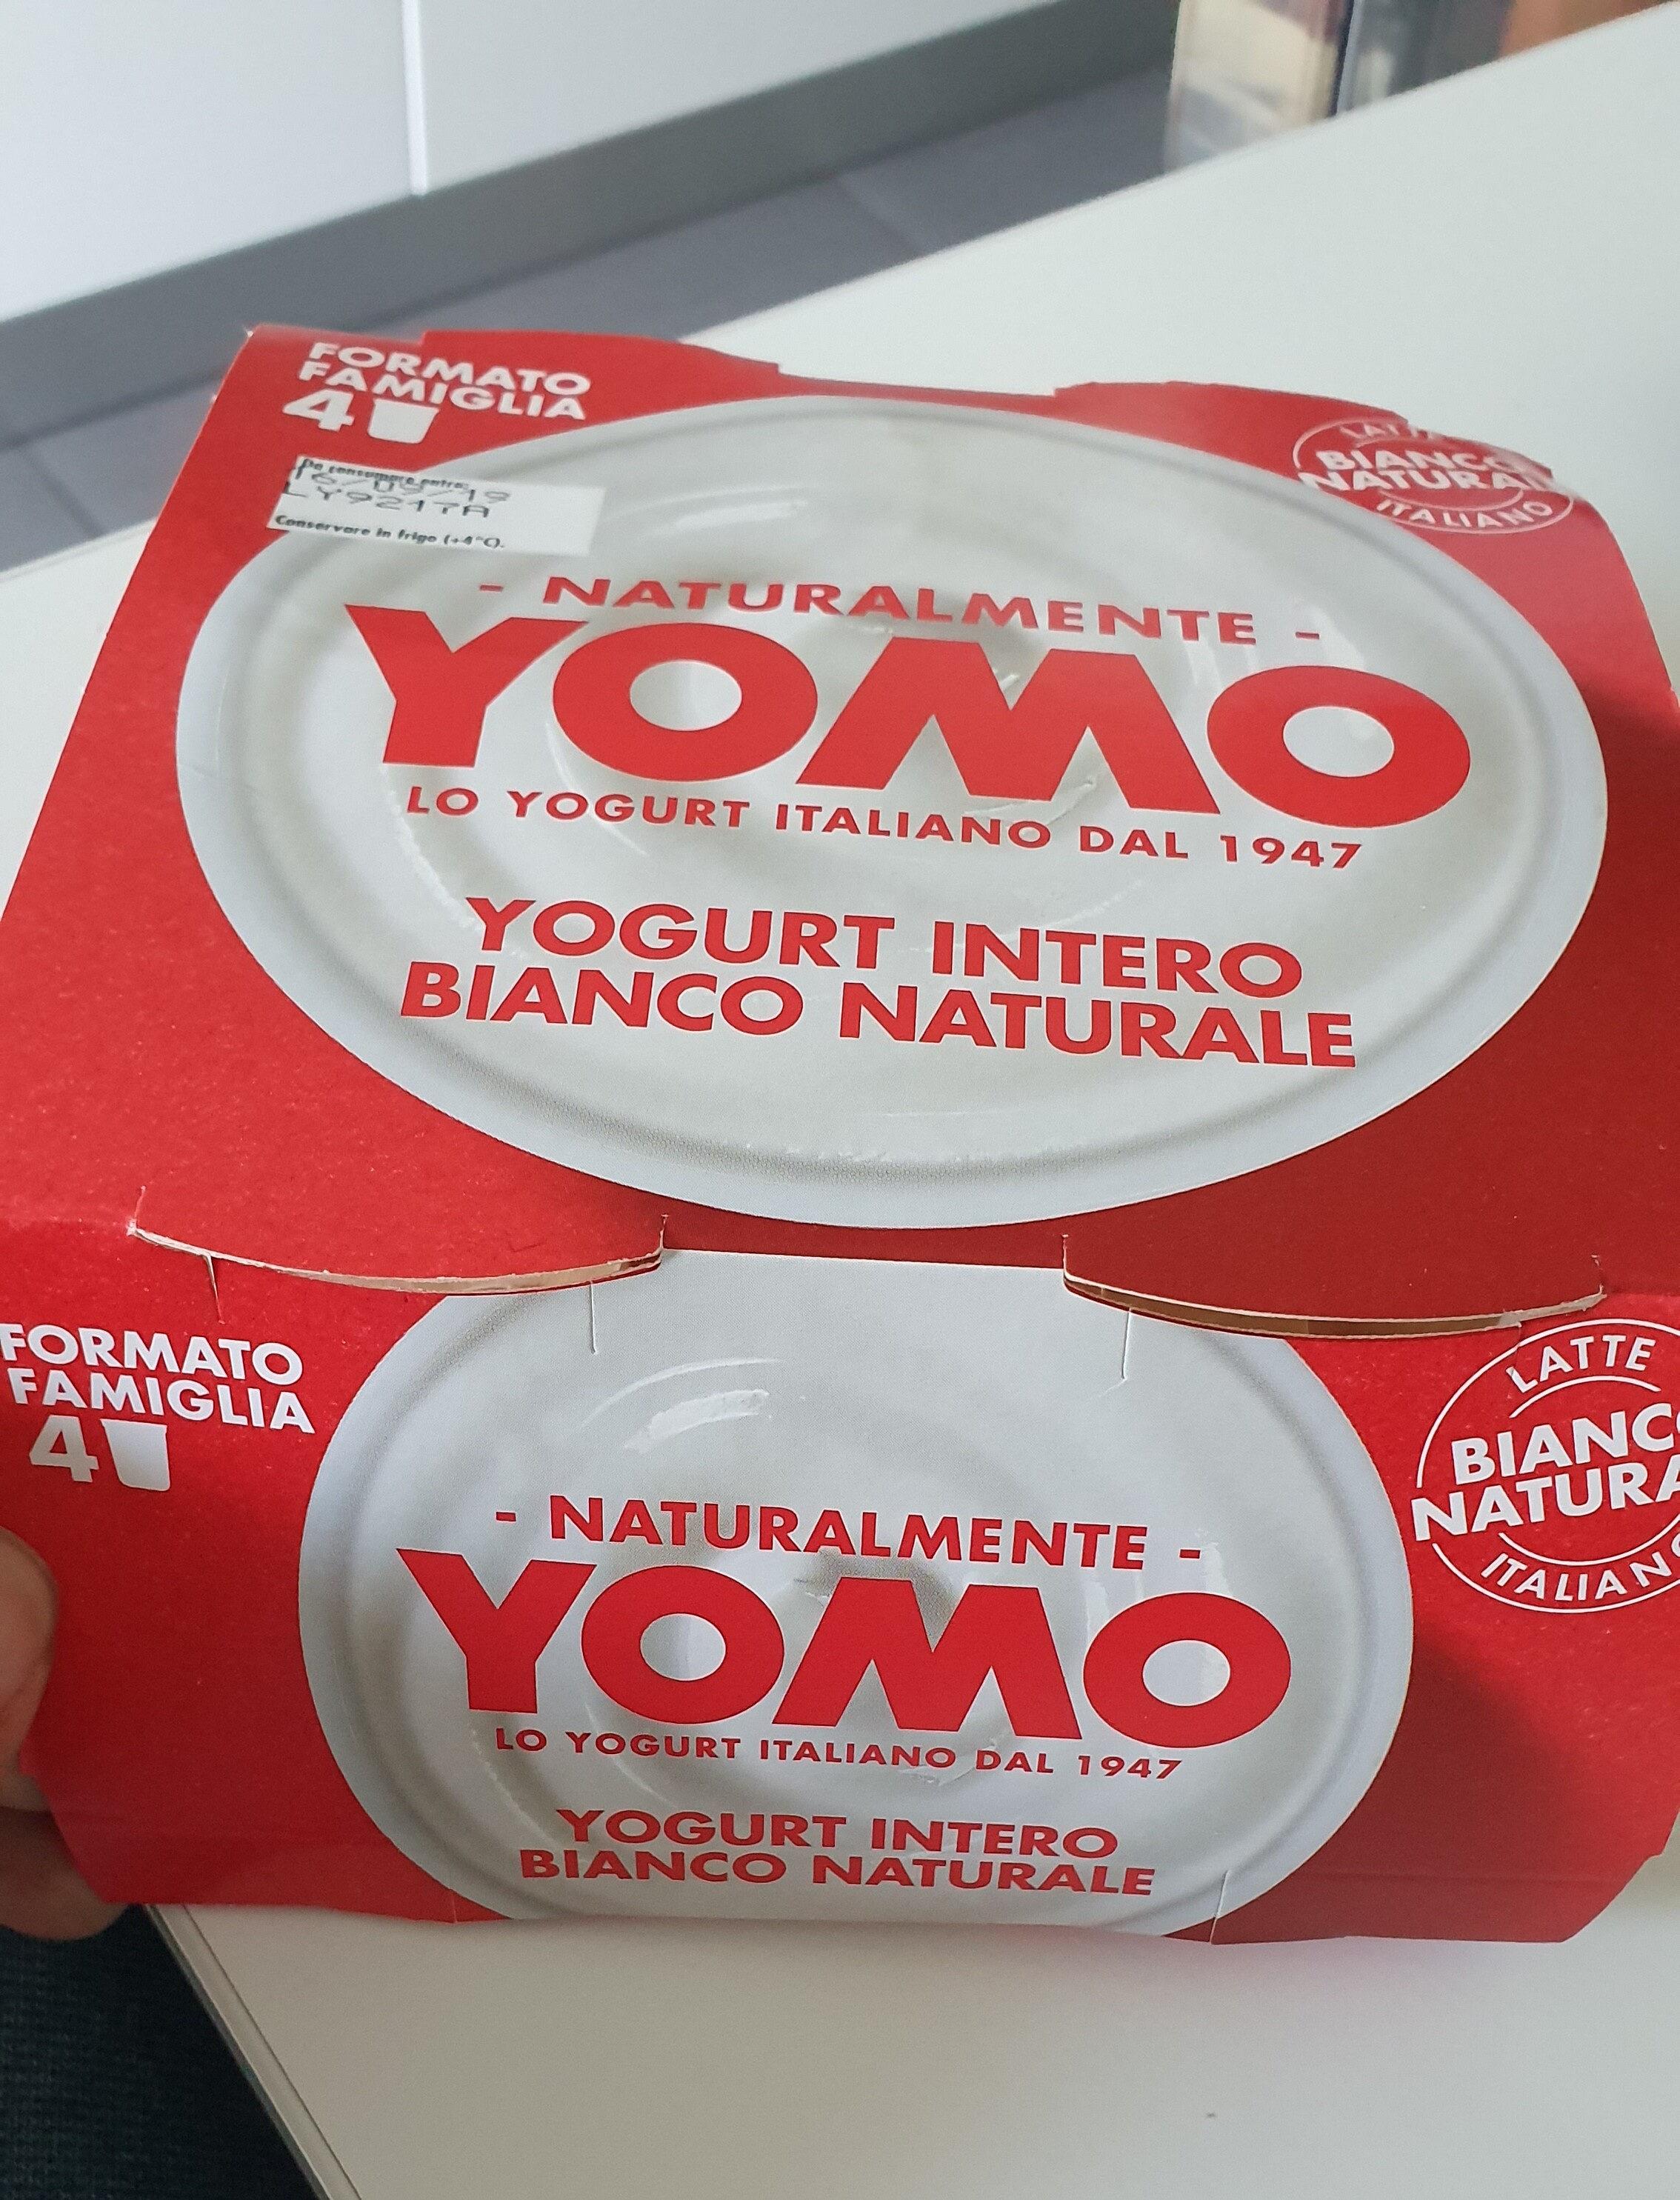 Yomo Yogurt intero Bianco Naturale - Product